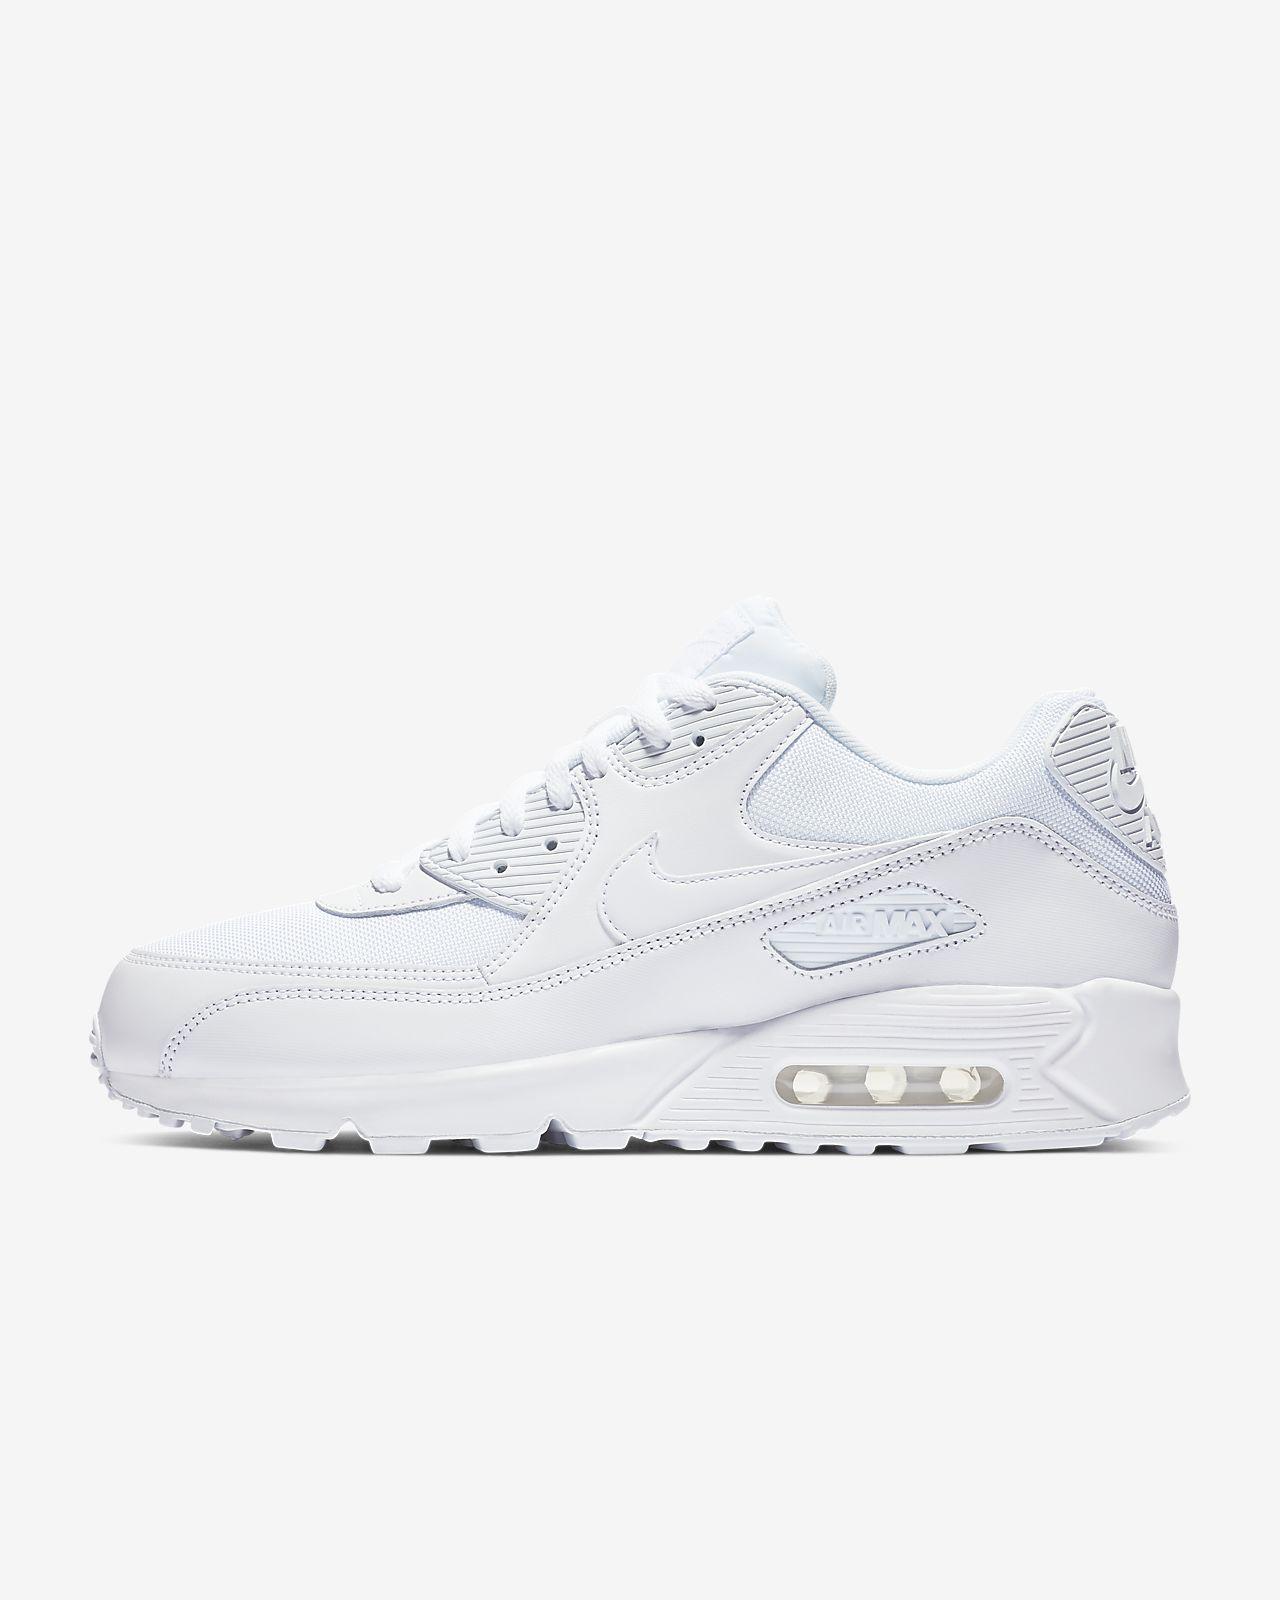 quality design 57779 3a3a9 Nike Air Max 90 Essential - sko til mænd